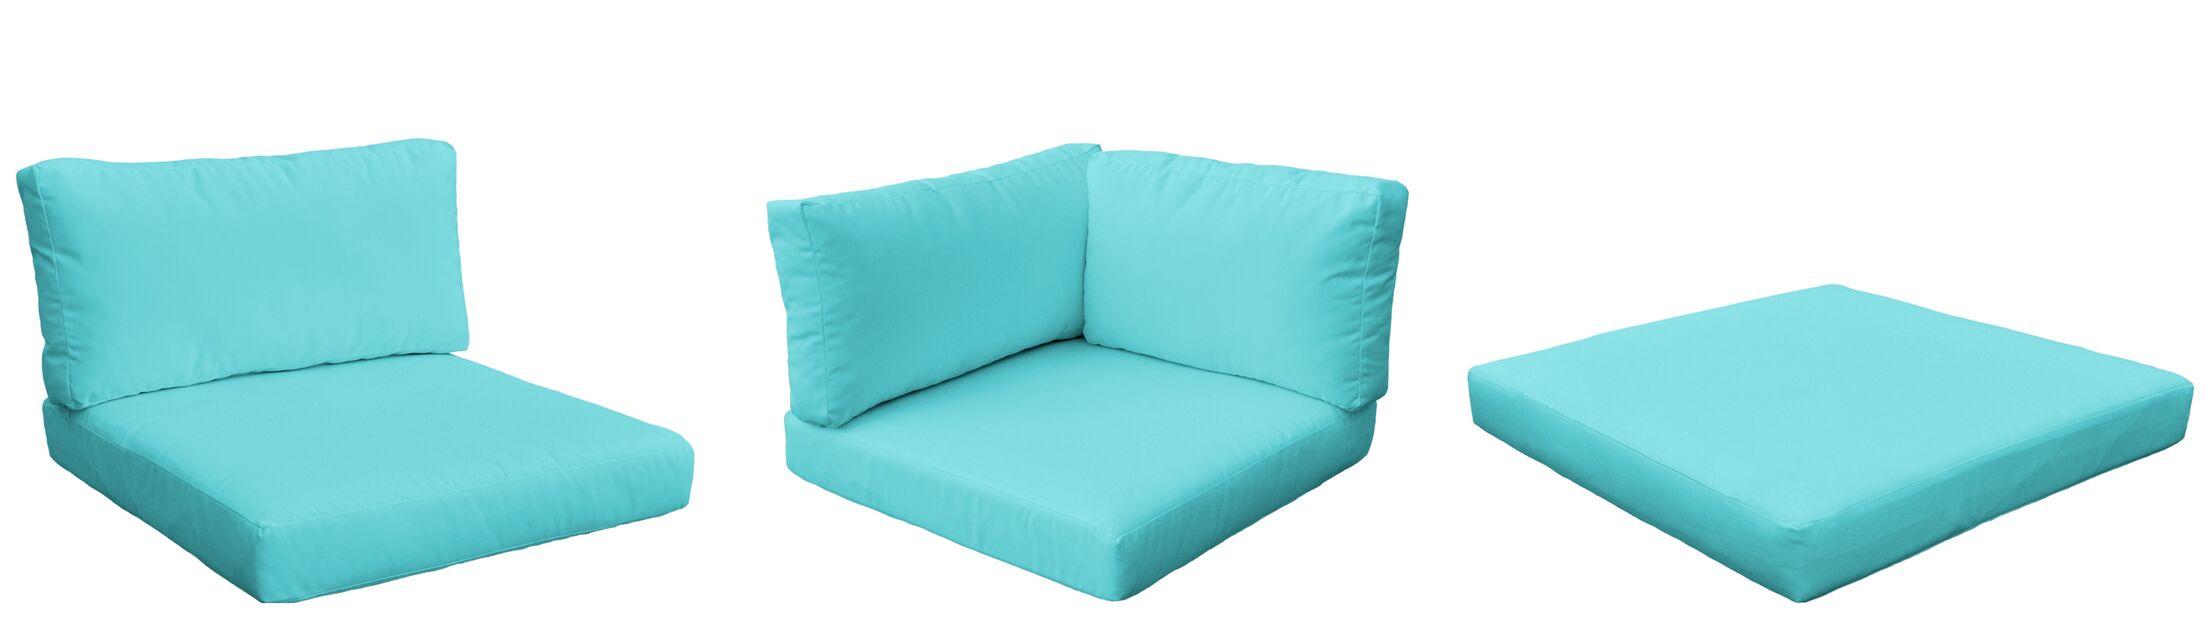 Monterey Outdoor 23 Piece Lounge Chair Cushion Set Fabric: Aruba